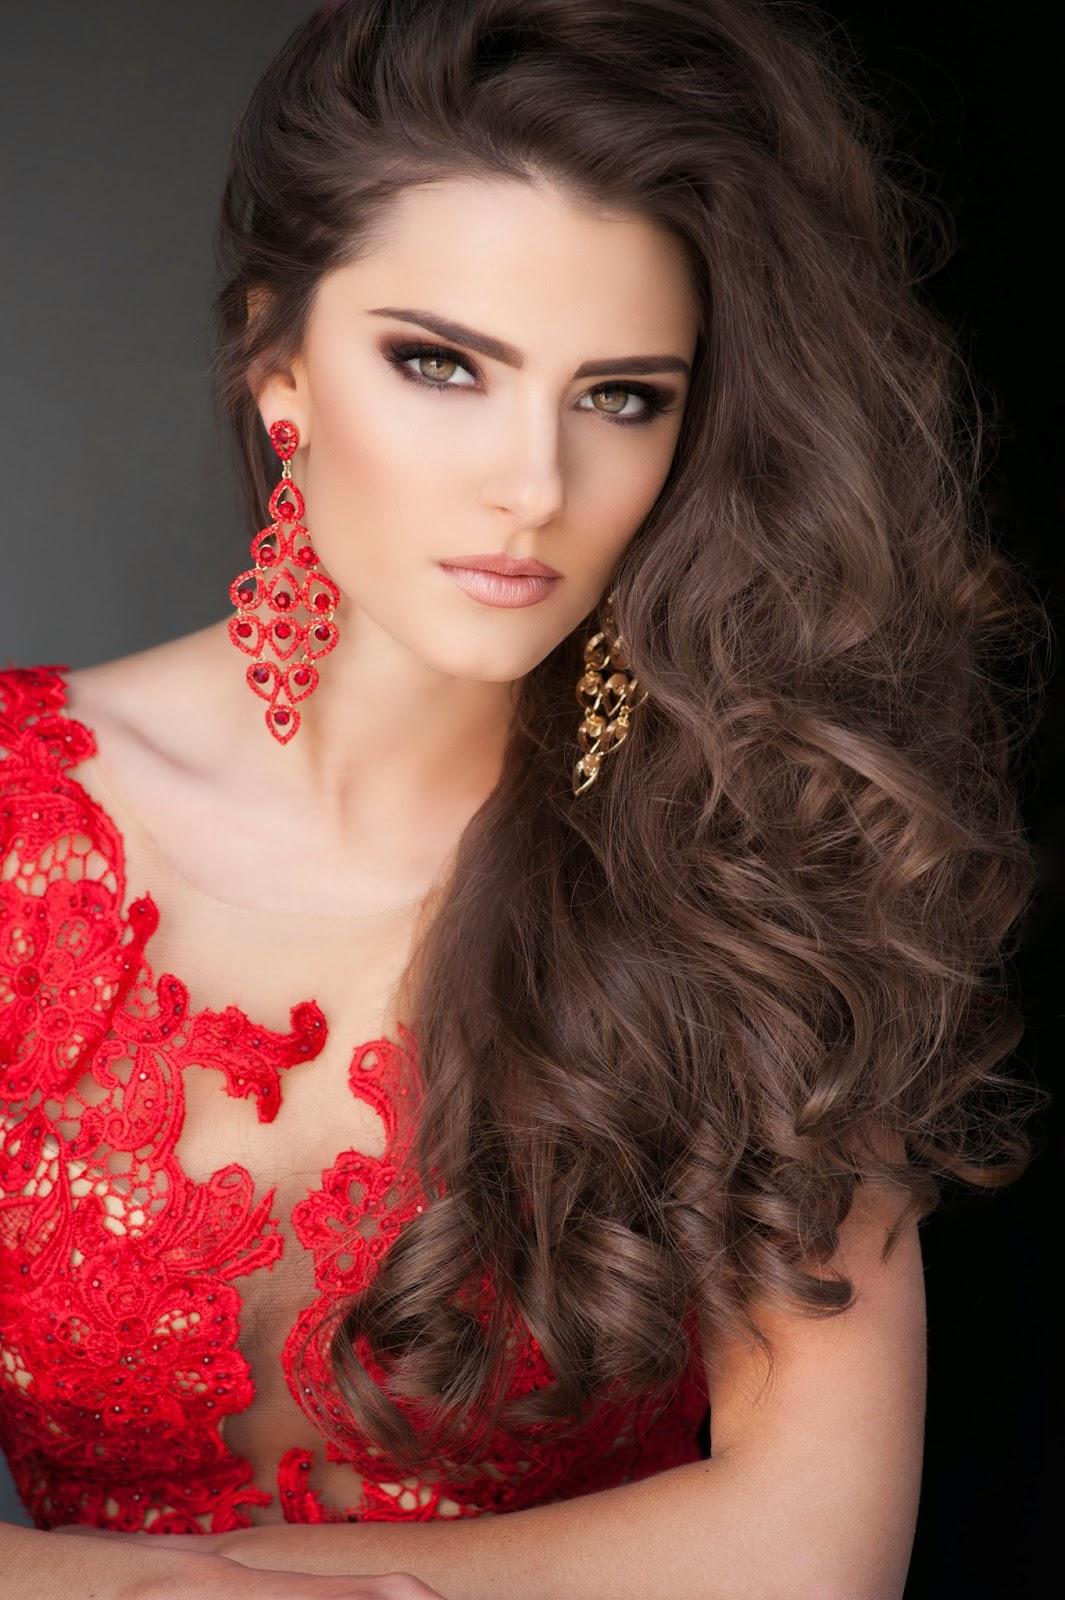 Pretty Ladies Trendy Short Hairstyles 2016: O Universo Dos Concursos: Miss Alabama USA 2014 Jesica Ahlberg